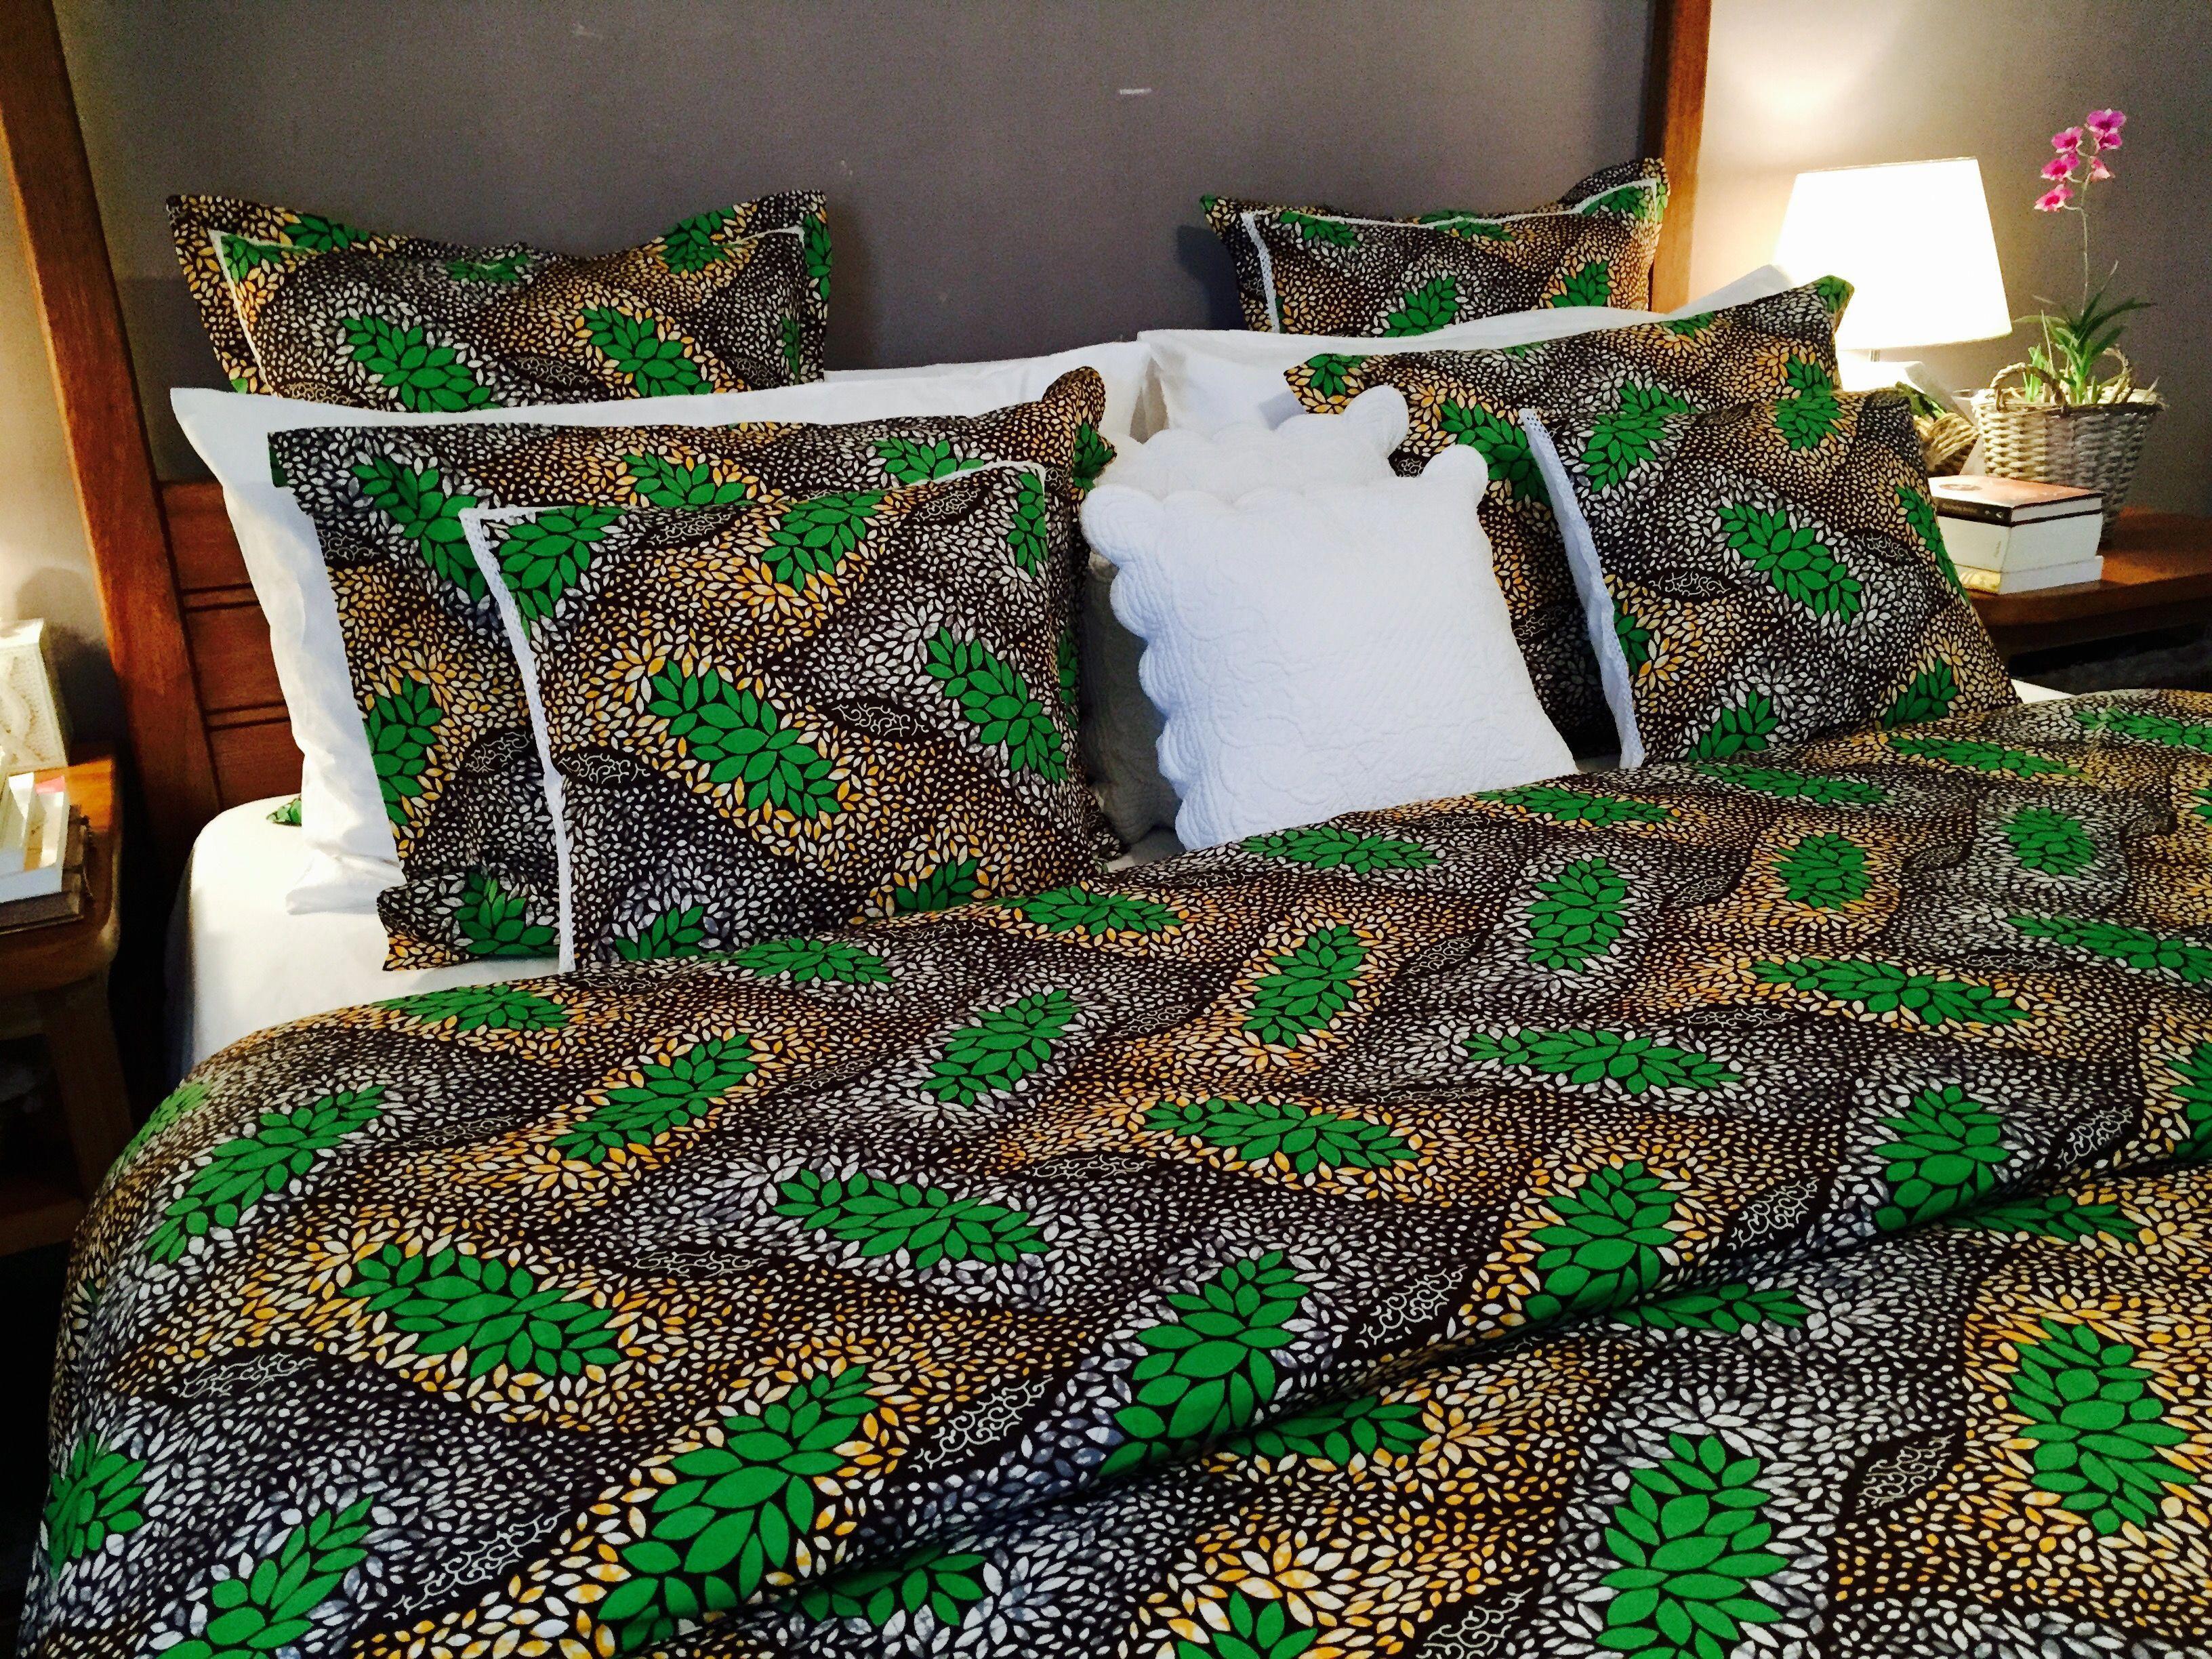 Furniture Bed Furnitureforbedroom Outsidefurniture En 2020 Idee Deco Chambre Deco Maison Et Deco Interieure